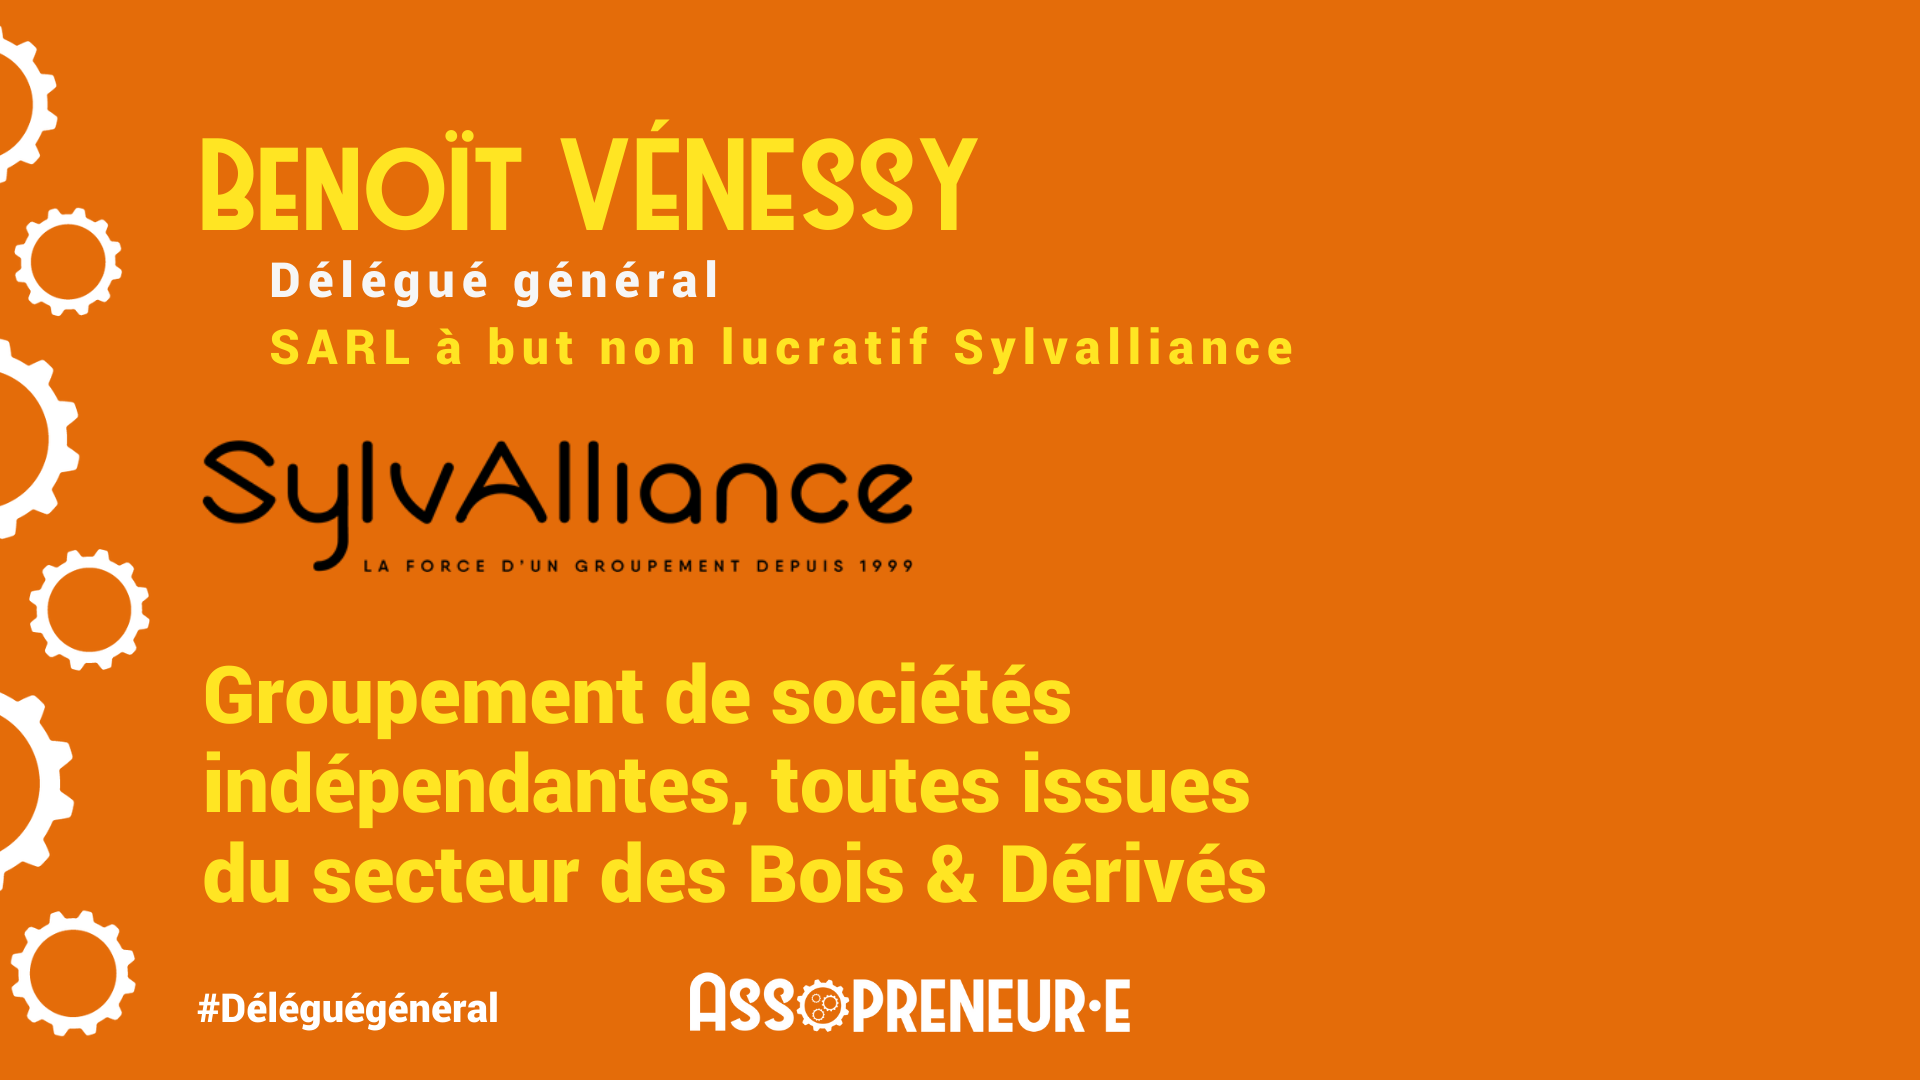 Benoit Venessy membre programme Assopreneur